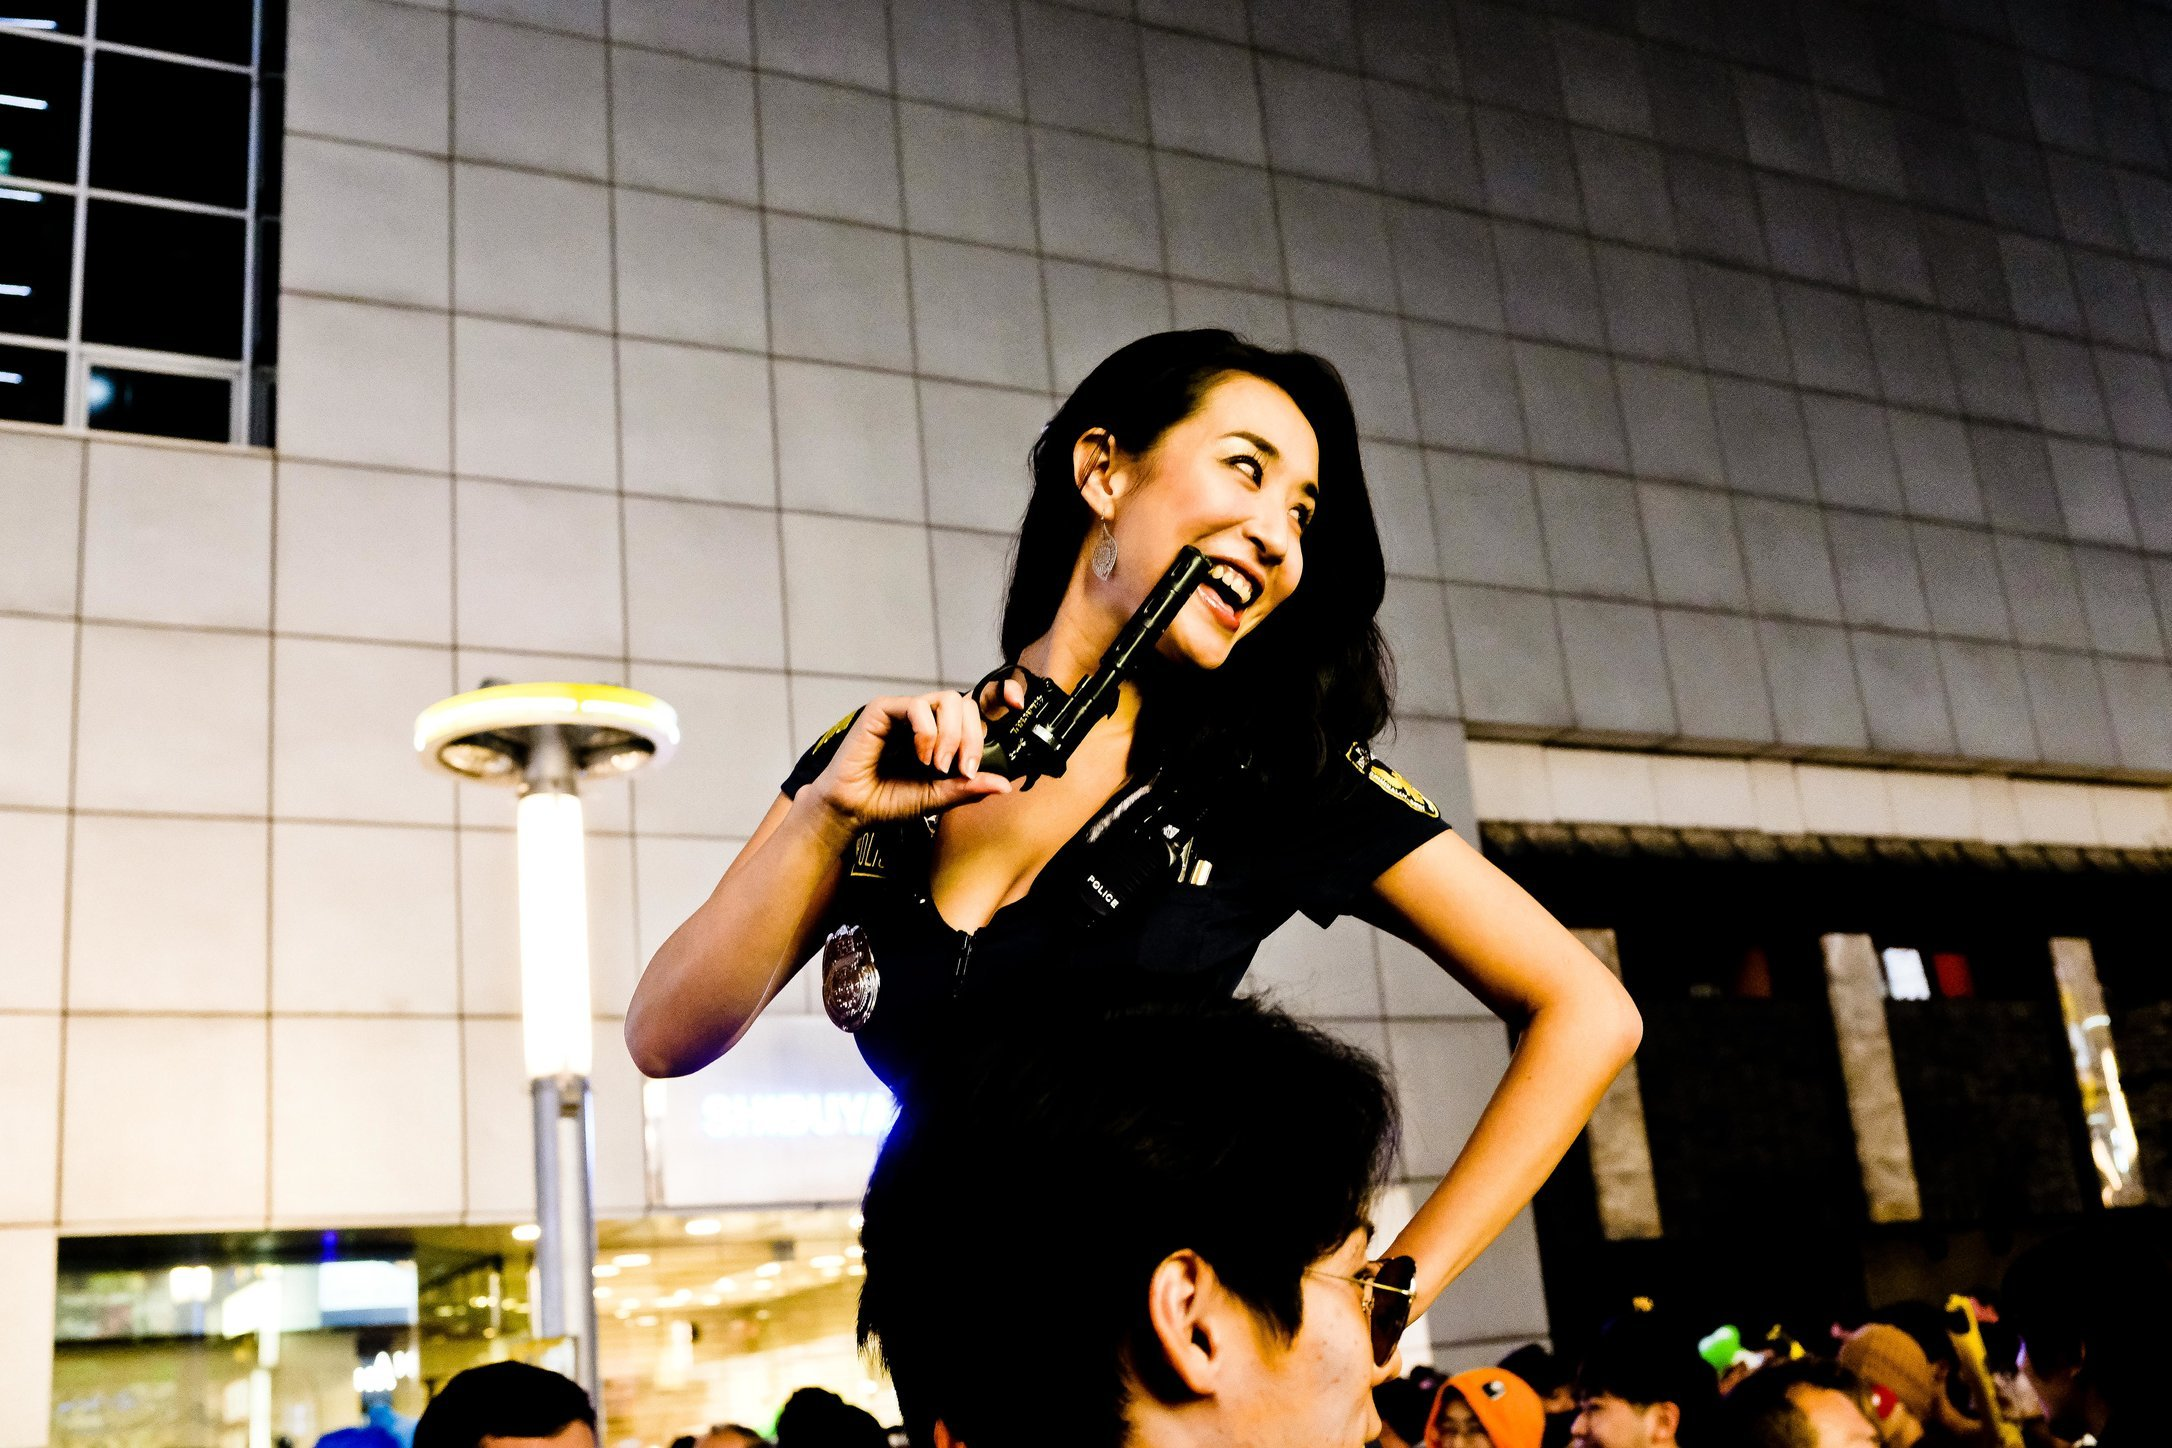 ShibuyaTimeWebsite-1.jpg